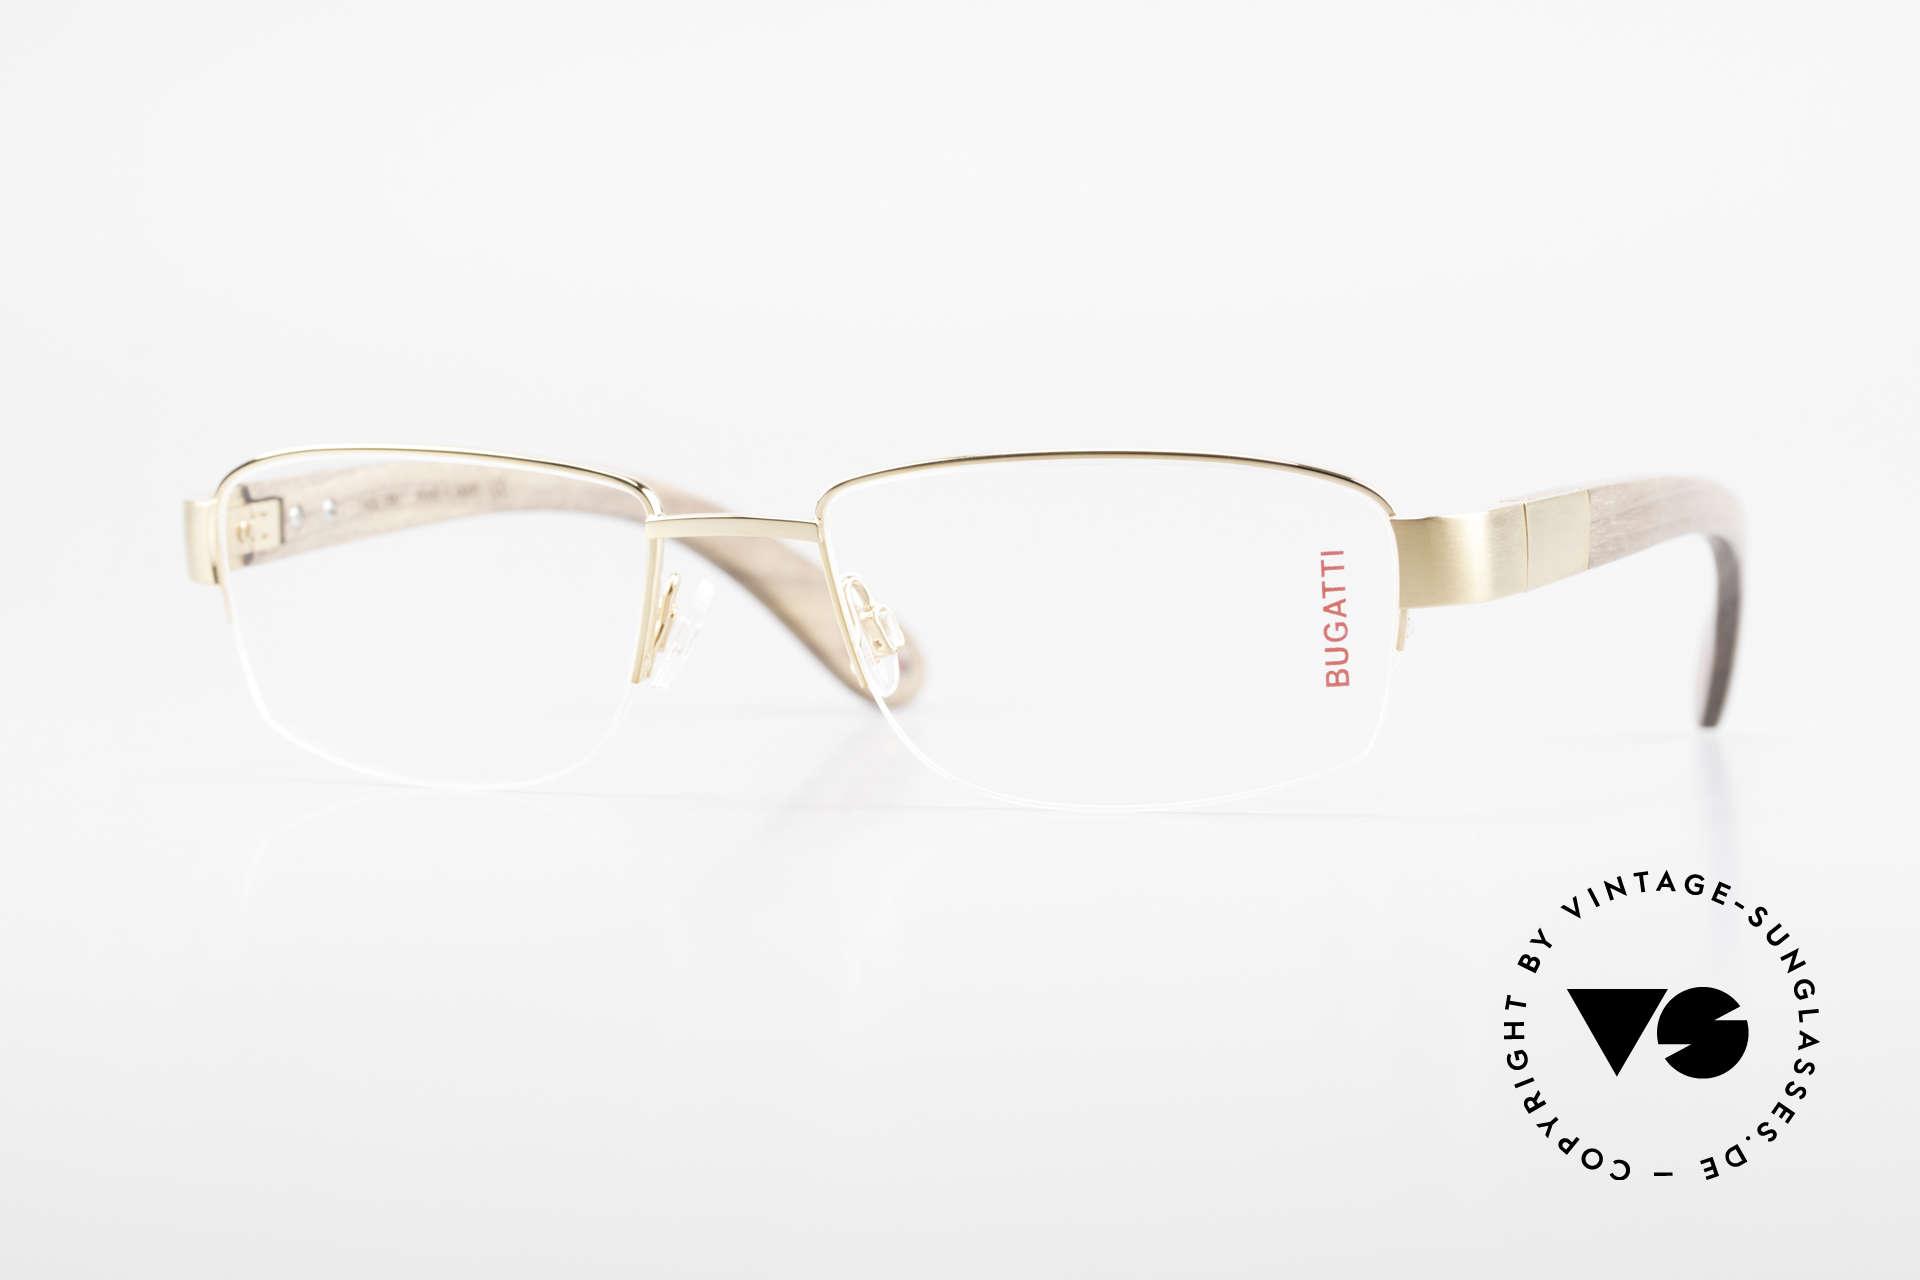 Bugatti 529 Wood Titanium Gold Plated XL, luxury eyeglasses by BUGATTI, TOP-NOTCH quality, Made for Men